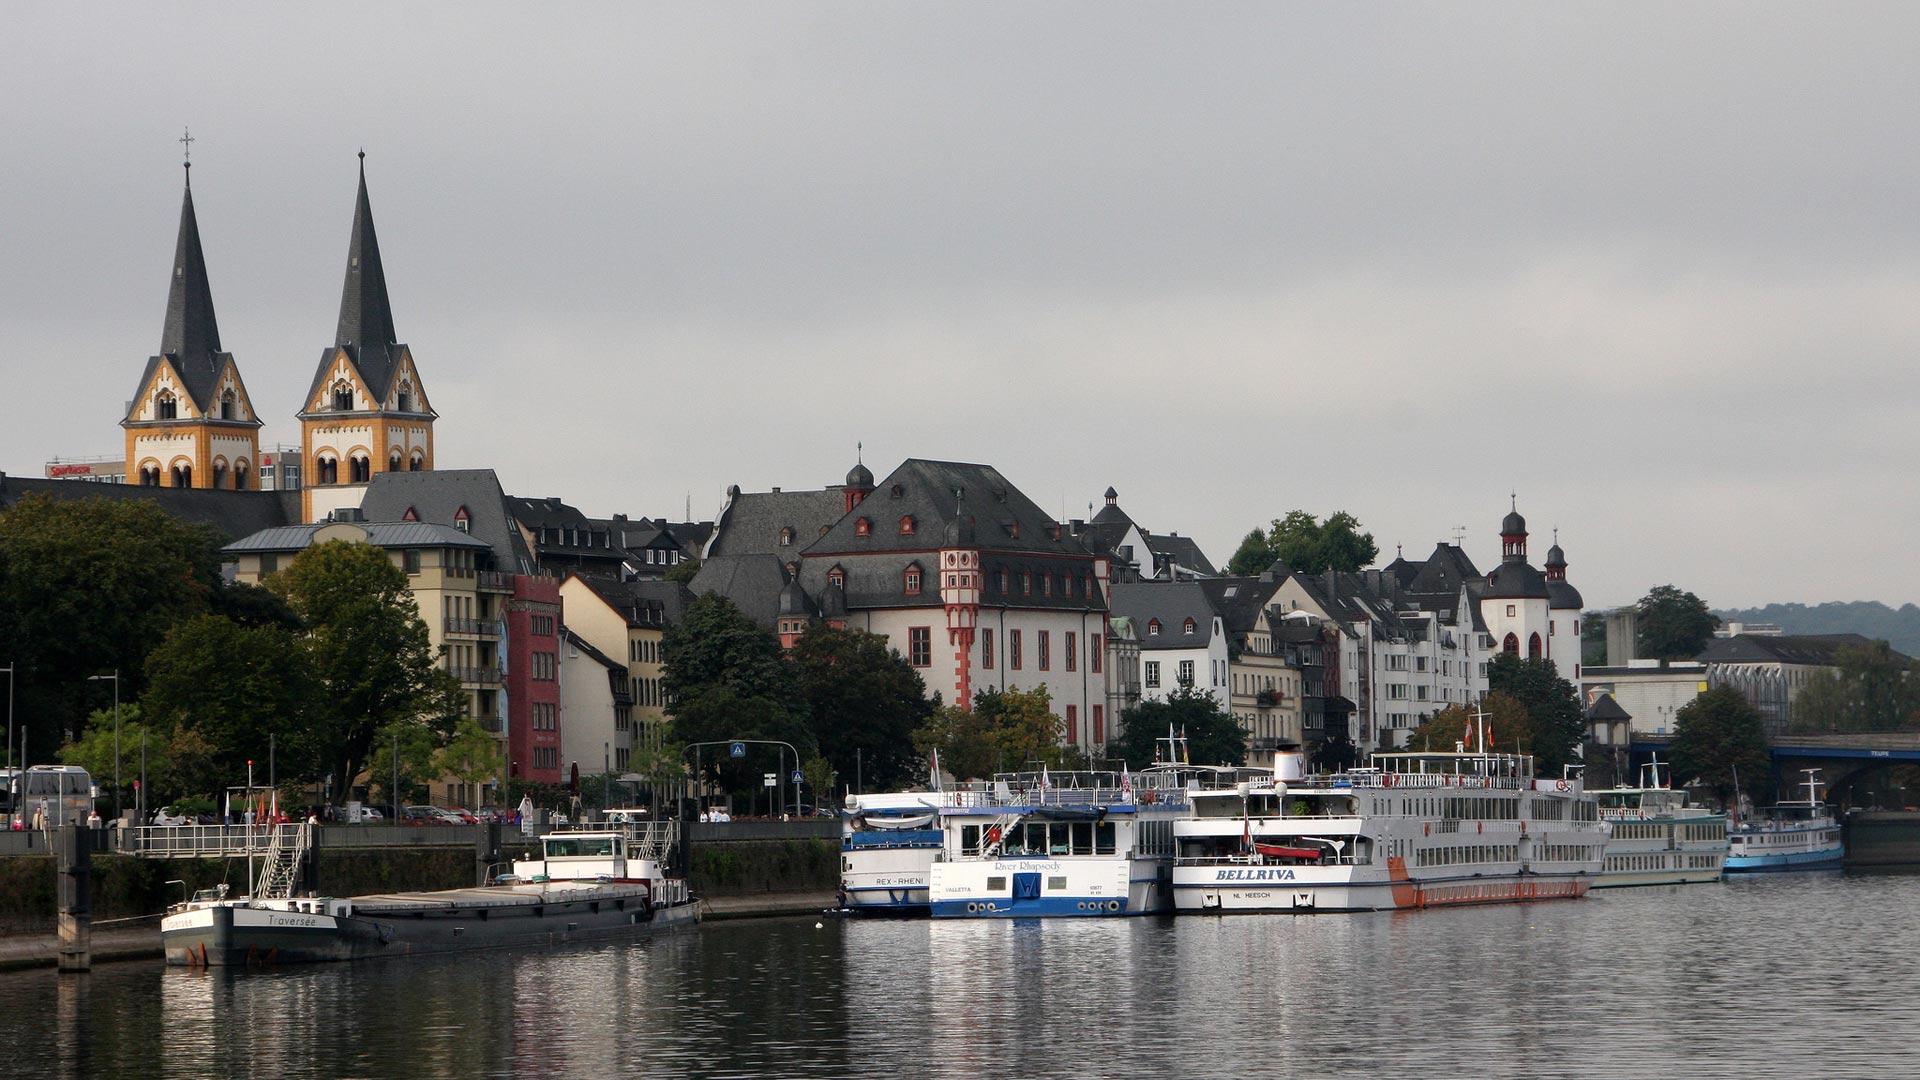 In Koblenz mondt de Moezel in de Rijn. © SE-Tours